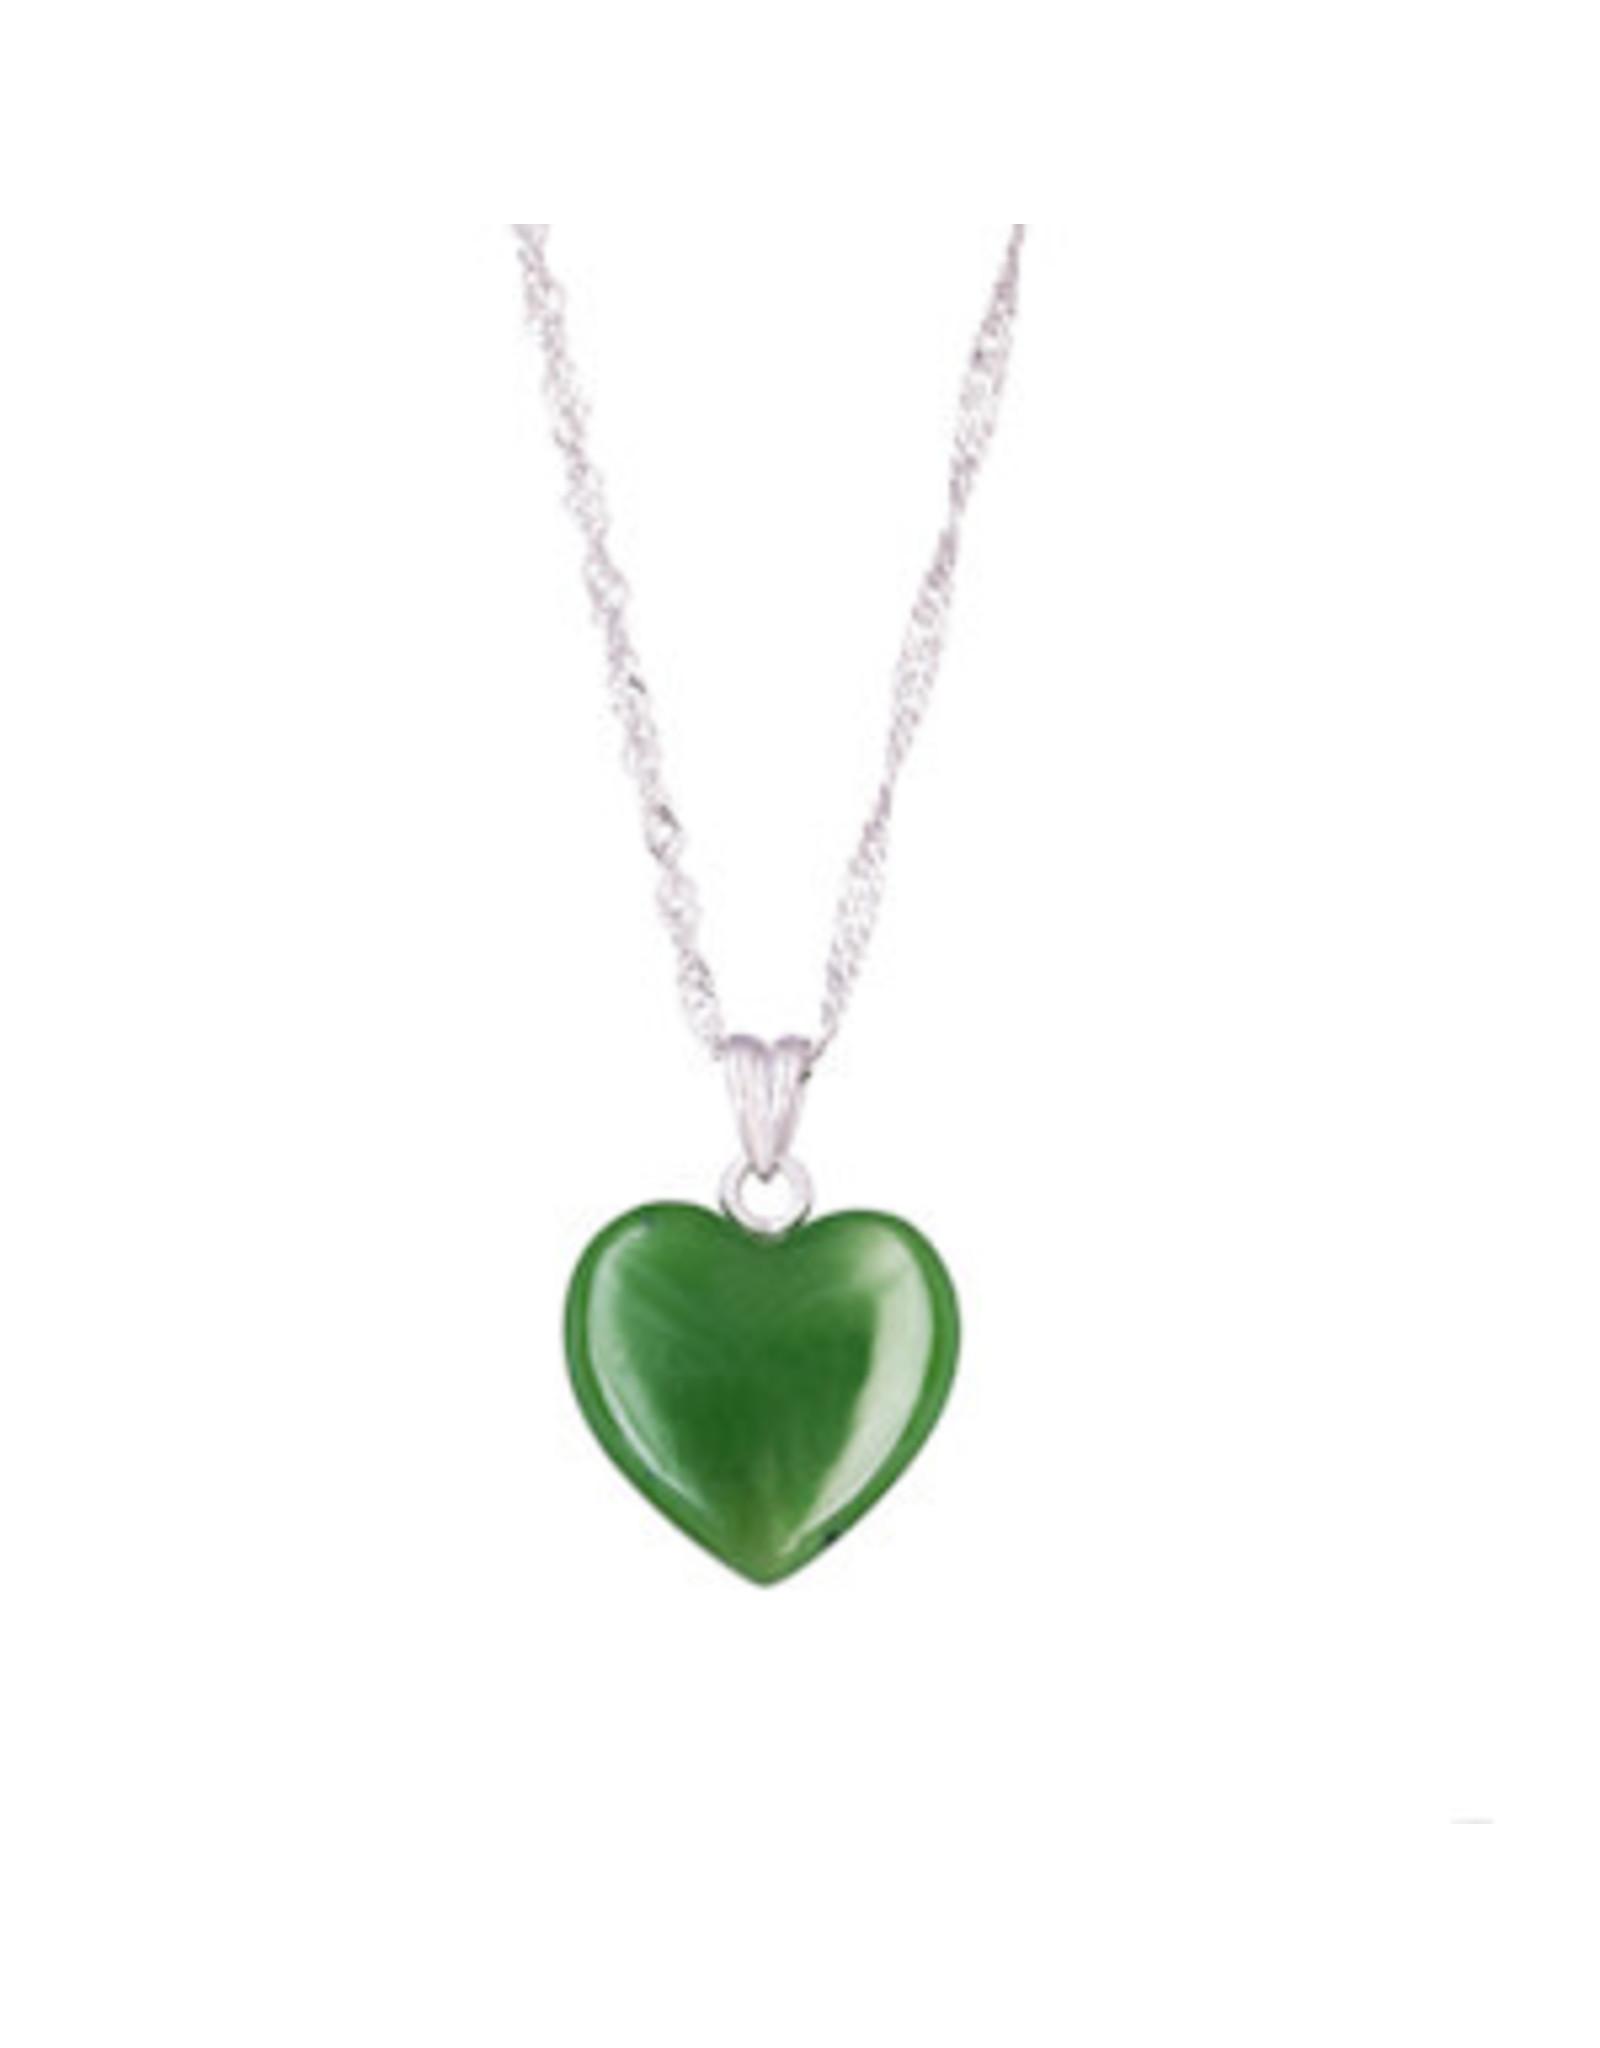 Heart Jade Necklace - JPS114